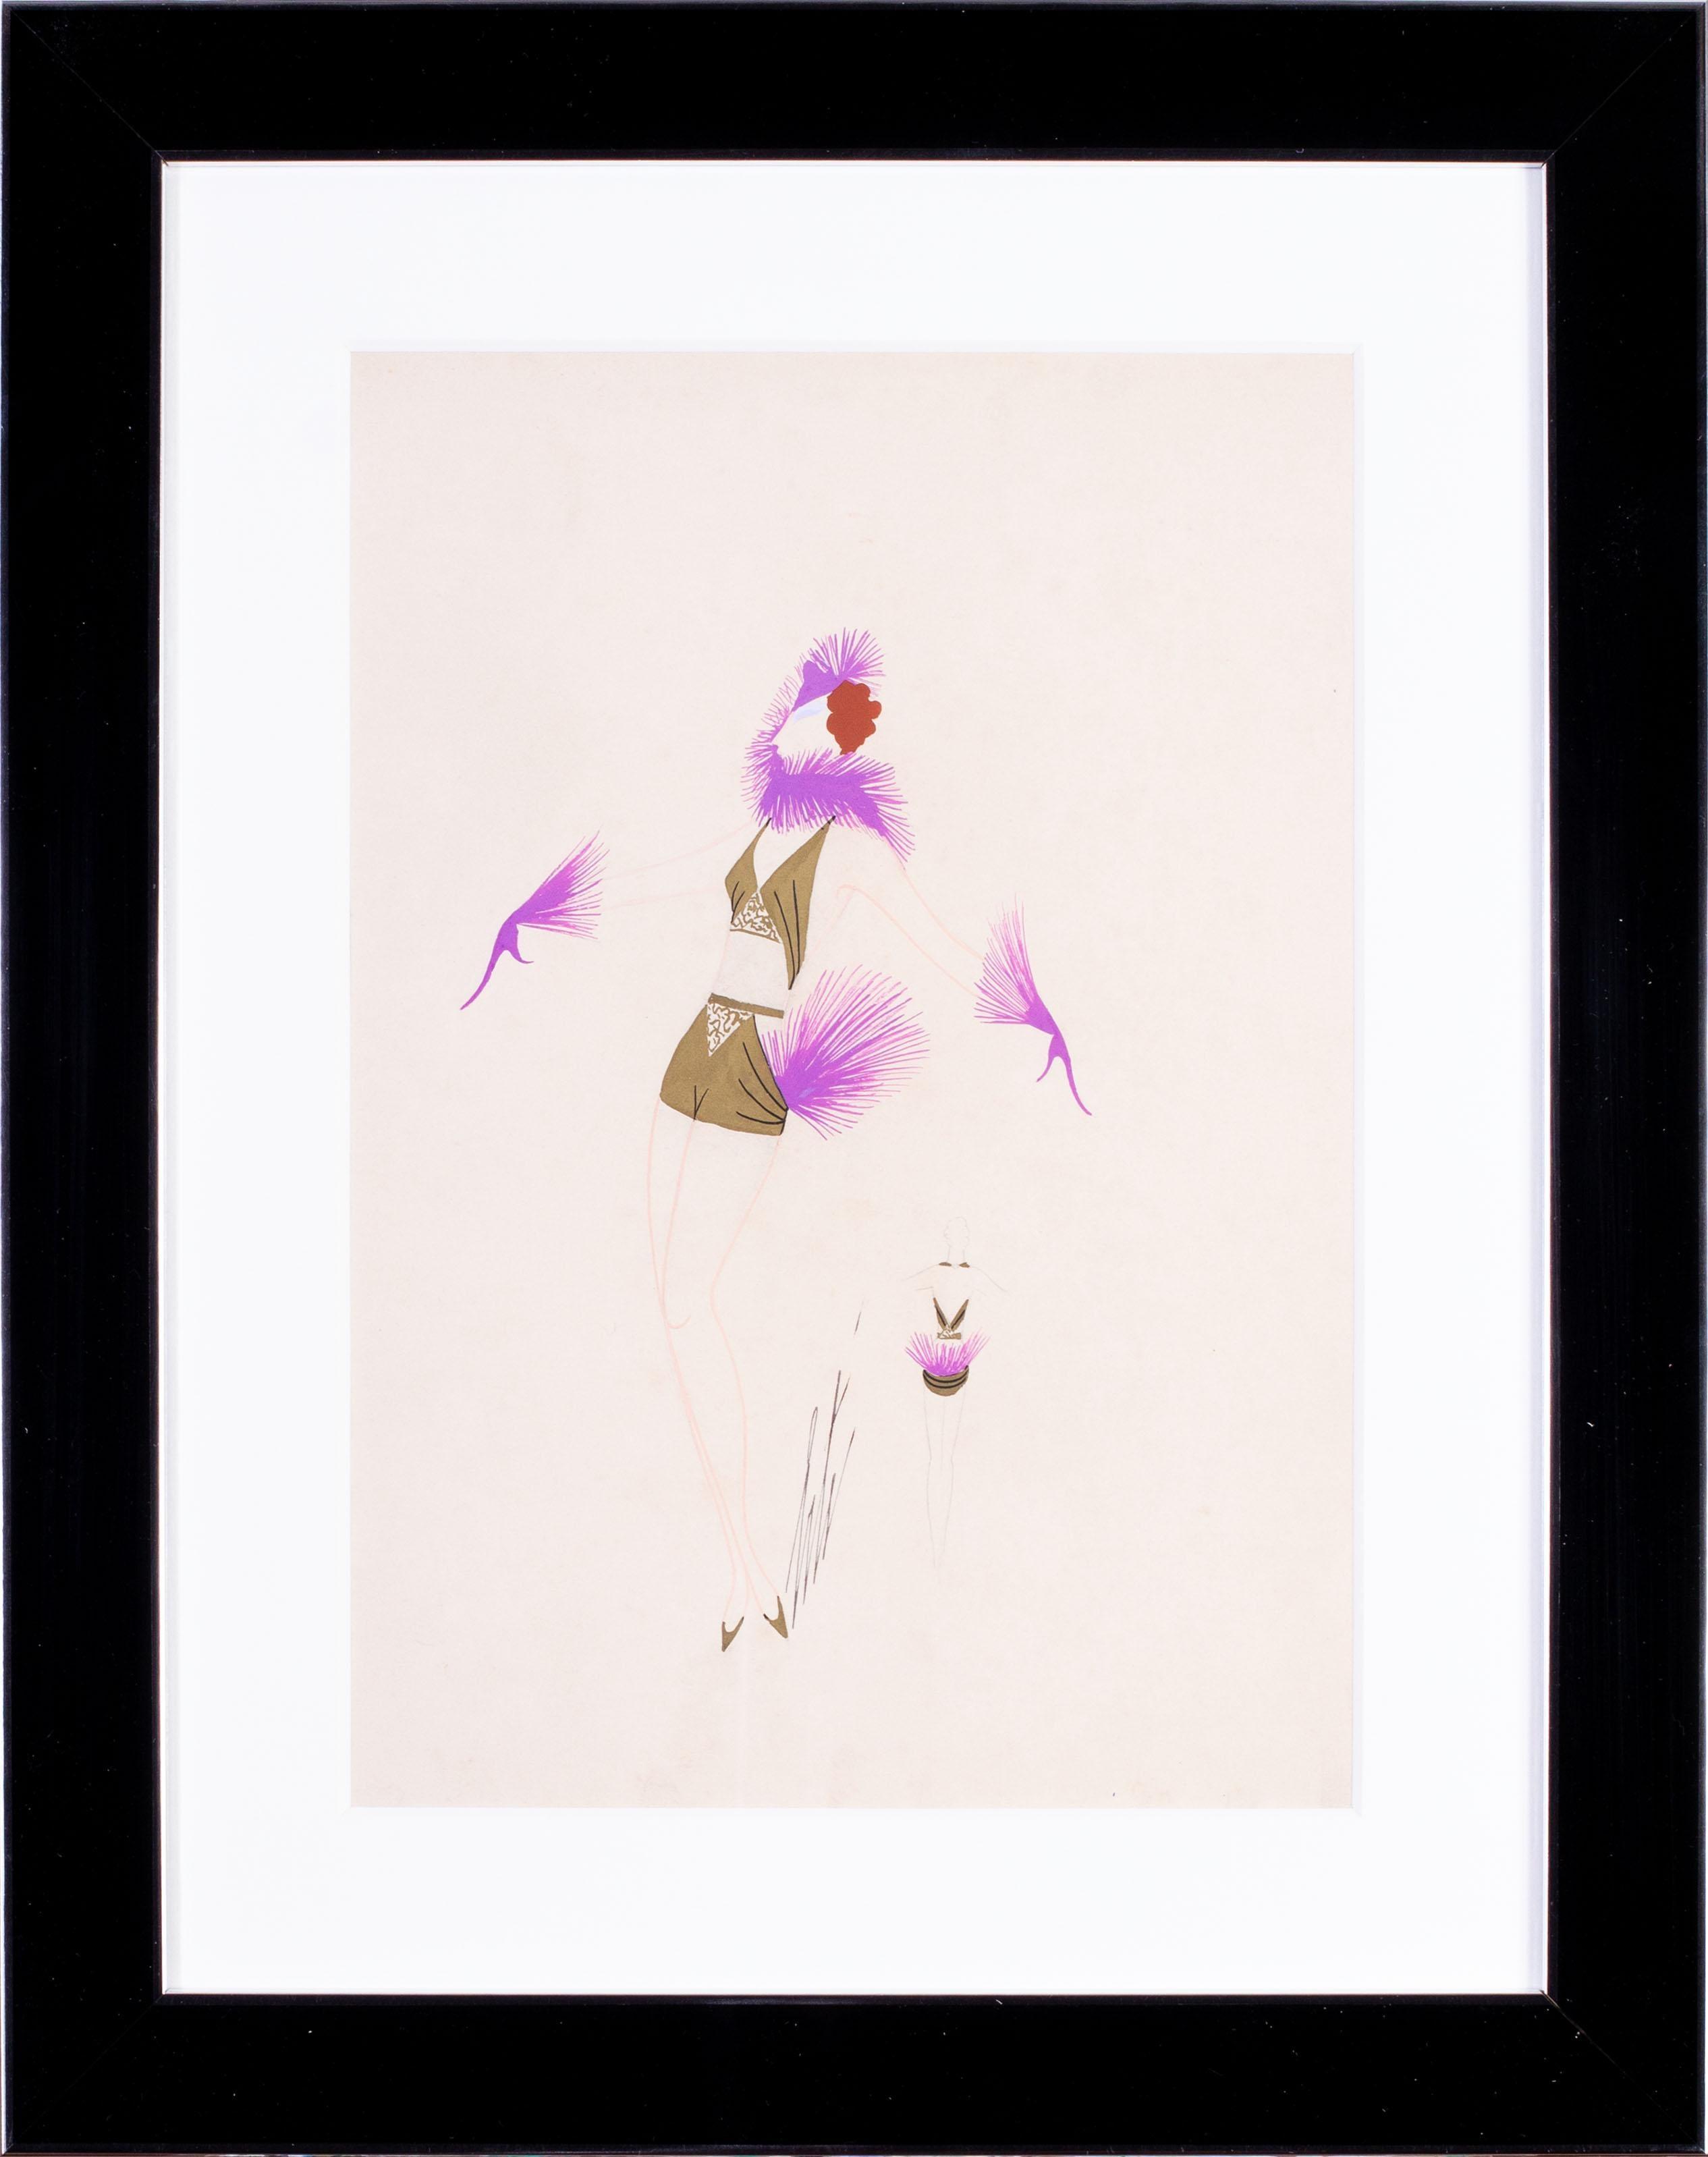 Original Art Deco gouache on paper fashion design by Russian, French artist Erte